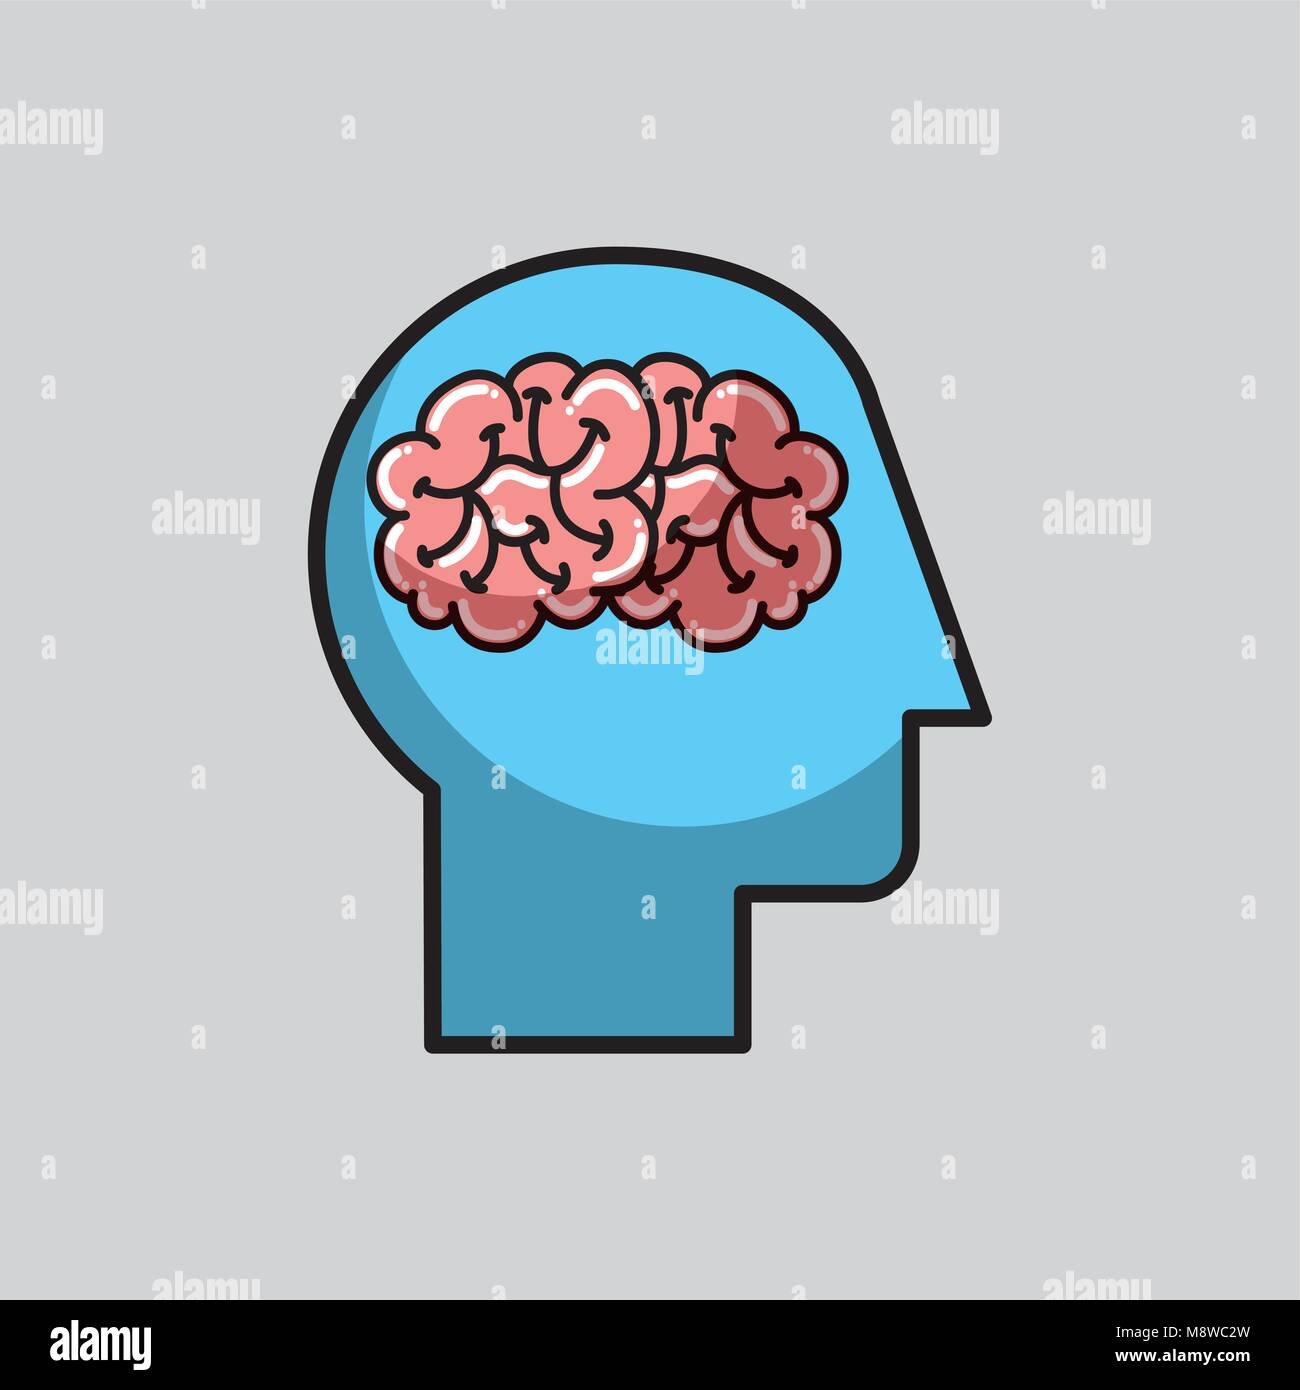 Silueta cabeza humana medical Imagen De Stock